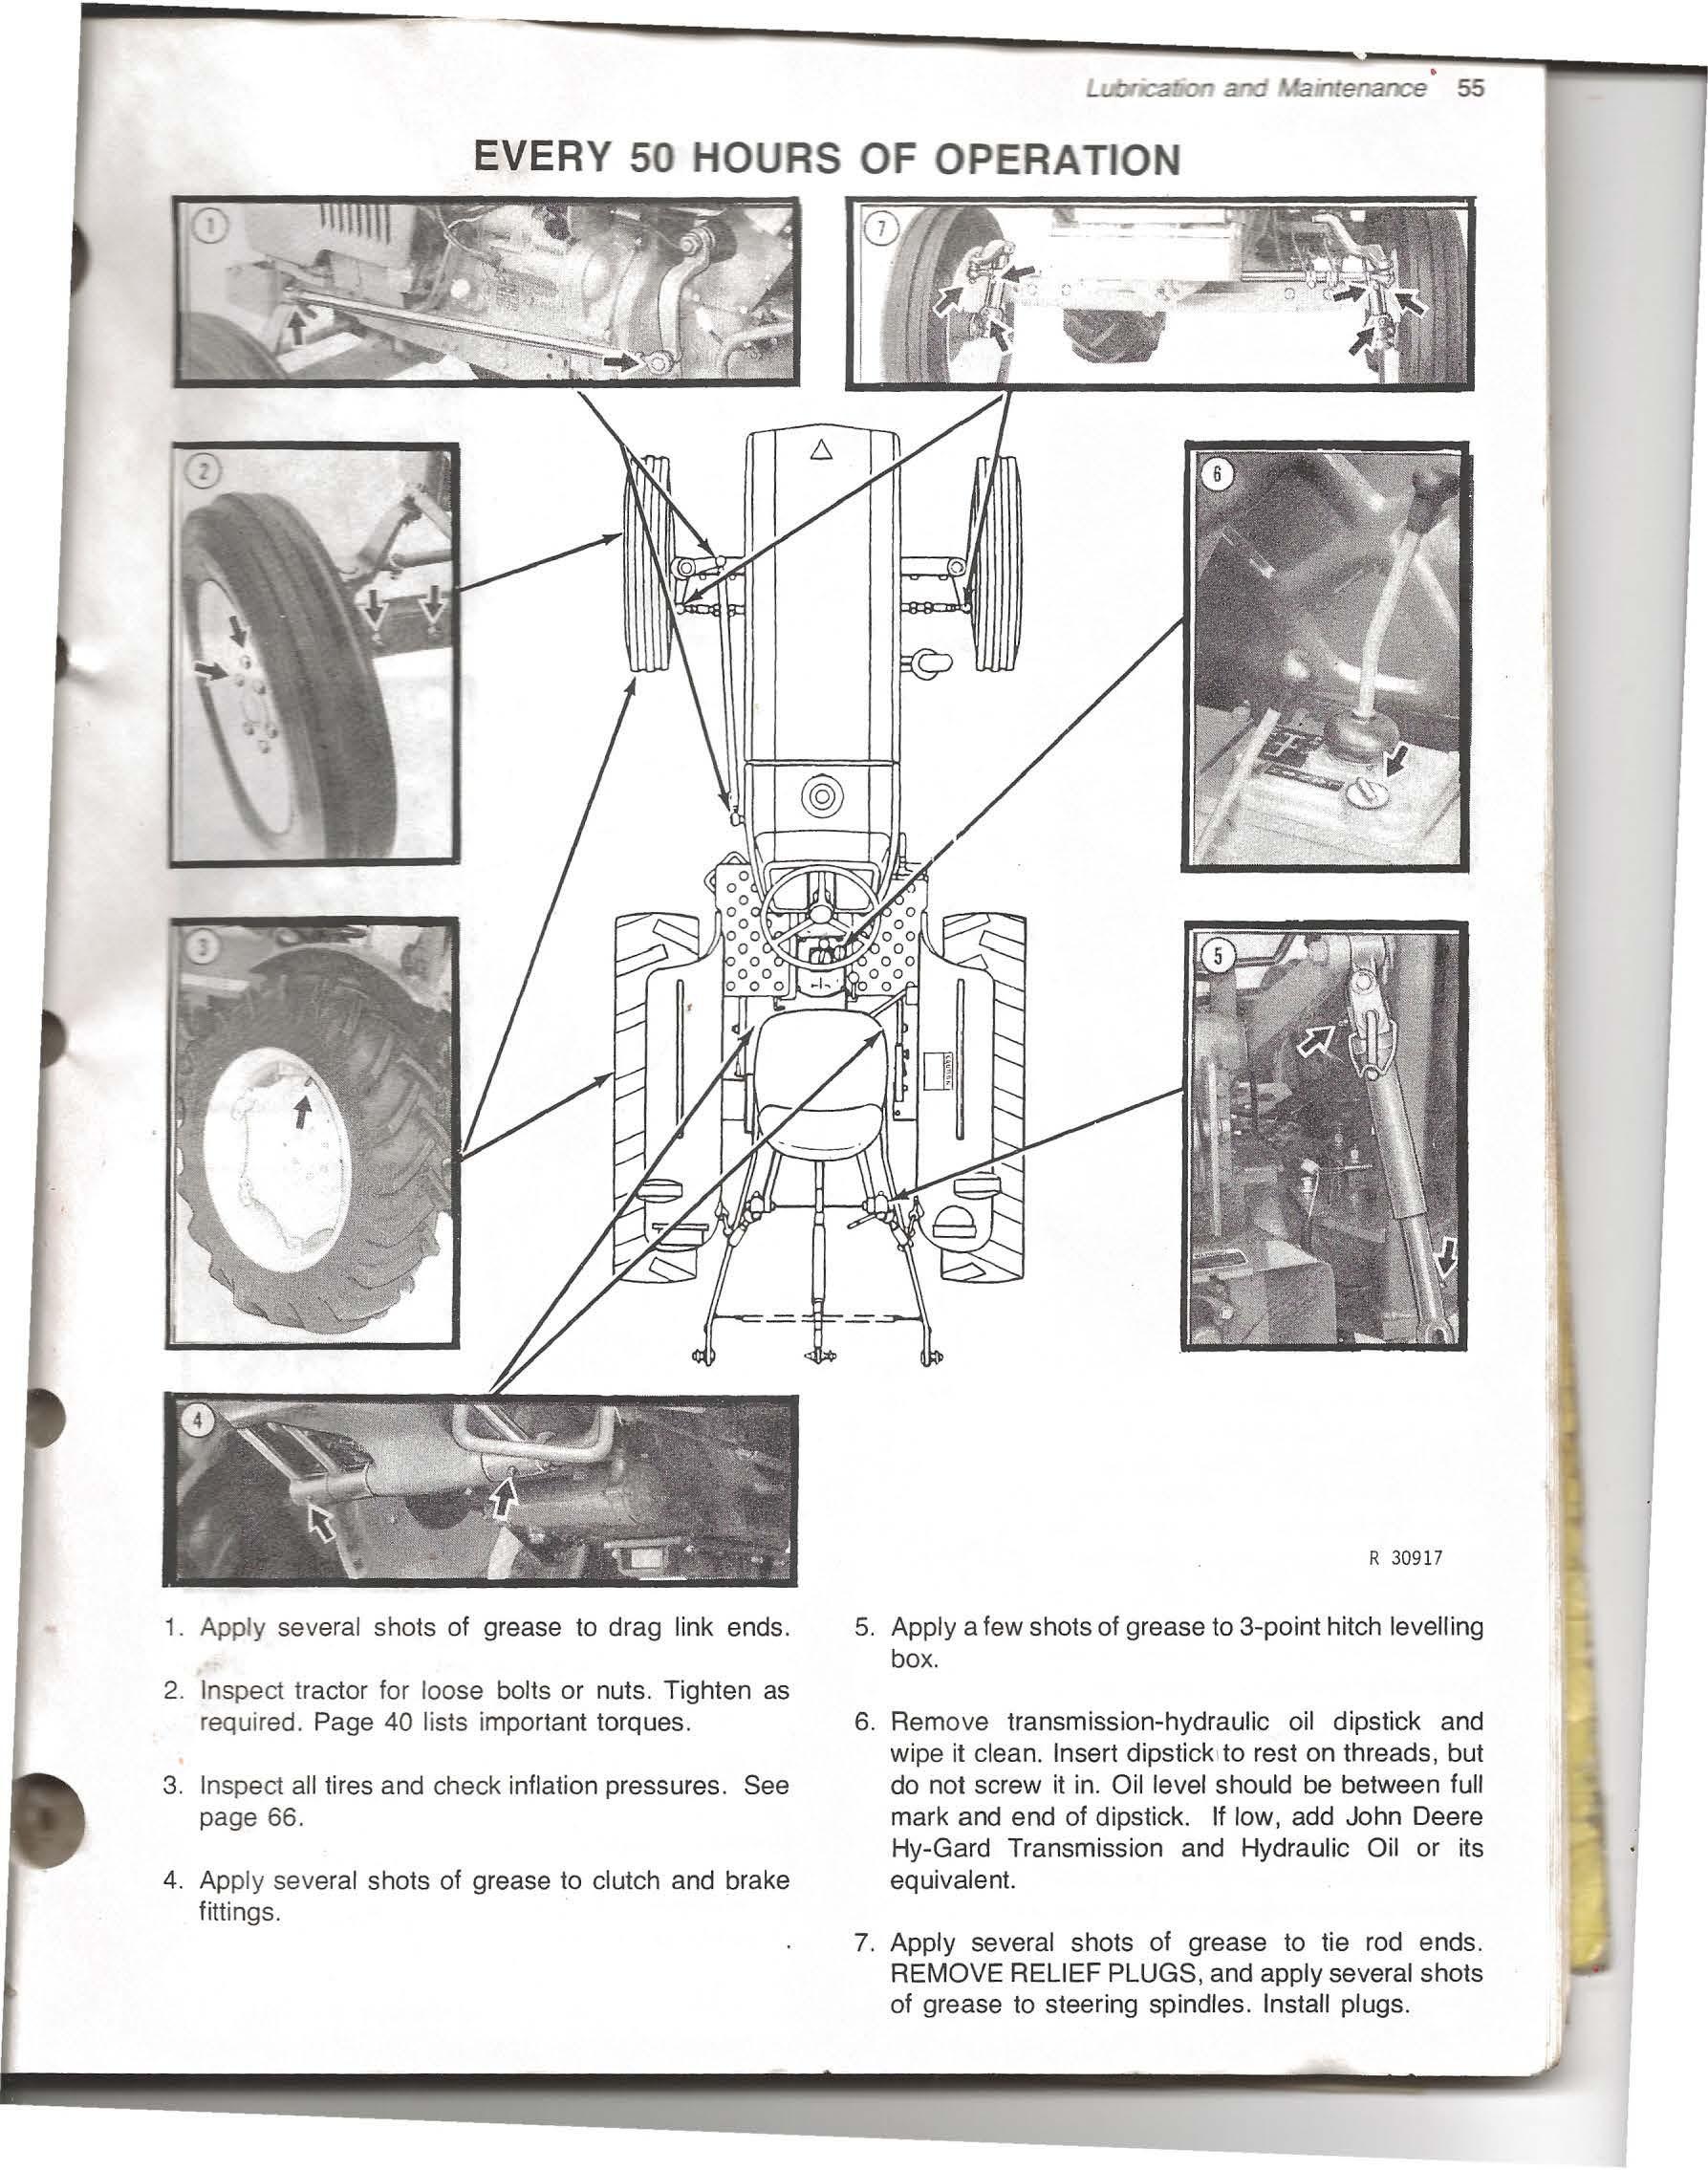 Gemütlich John Deere 50 Schaltplan Fotos - Elektrische Schaltplan ...